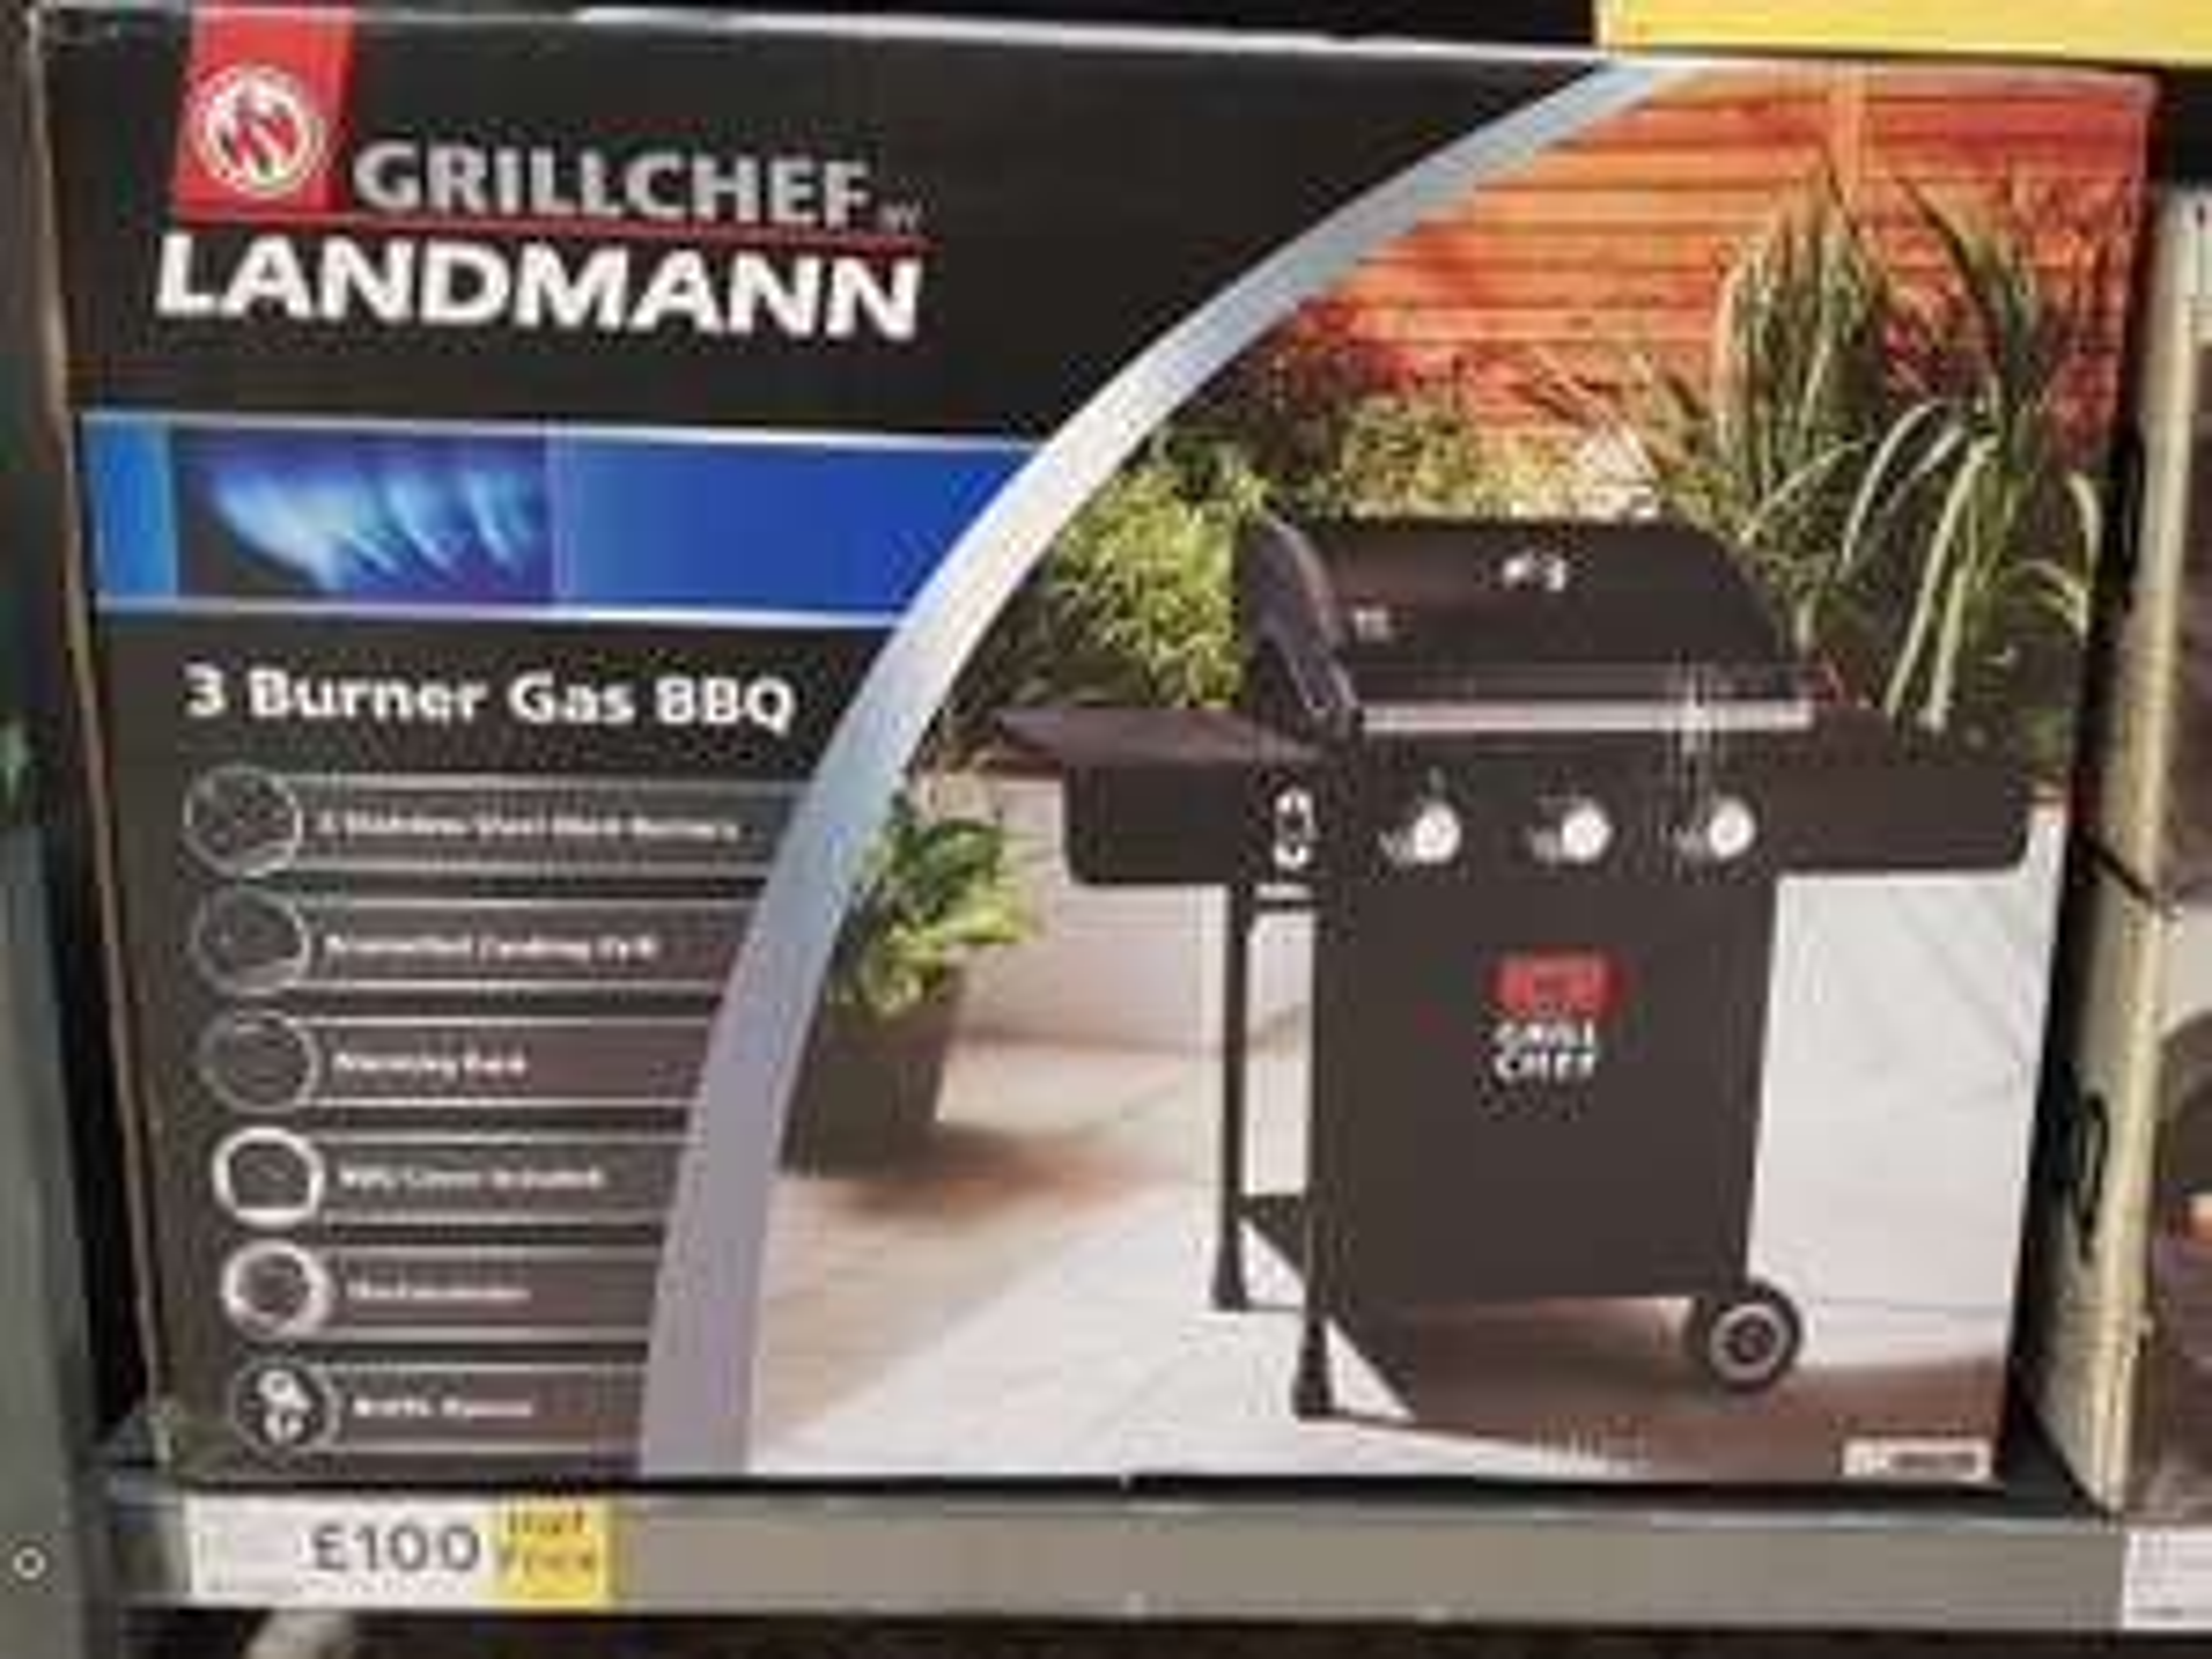 Landmann Grill Chef 3 Burner Gas BBQ instore at Tesco for £100